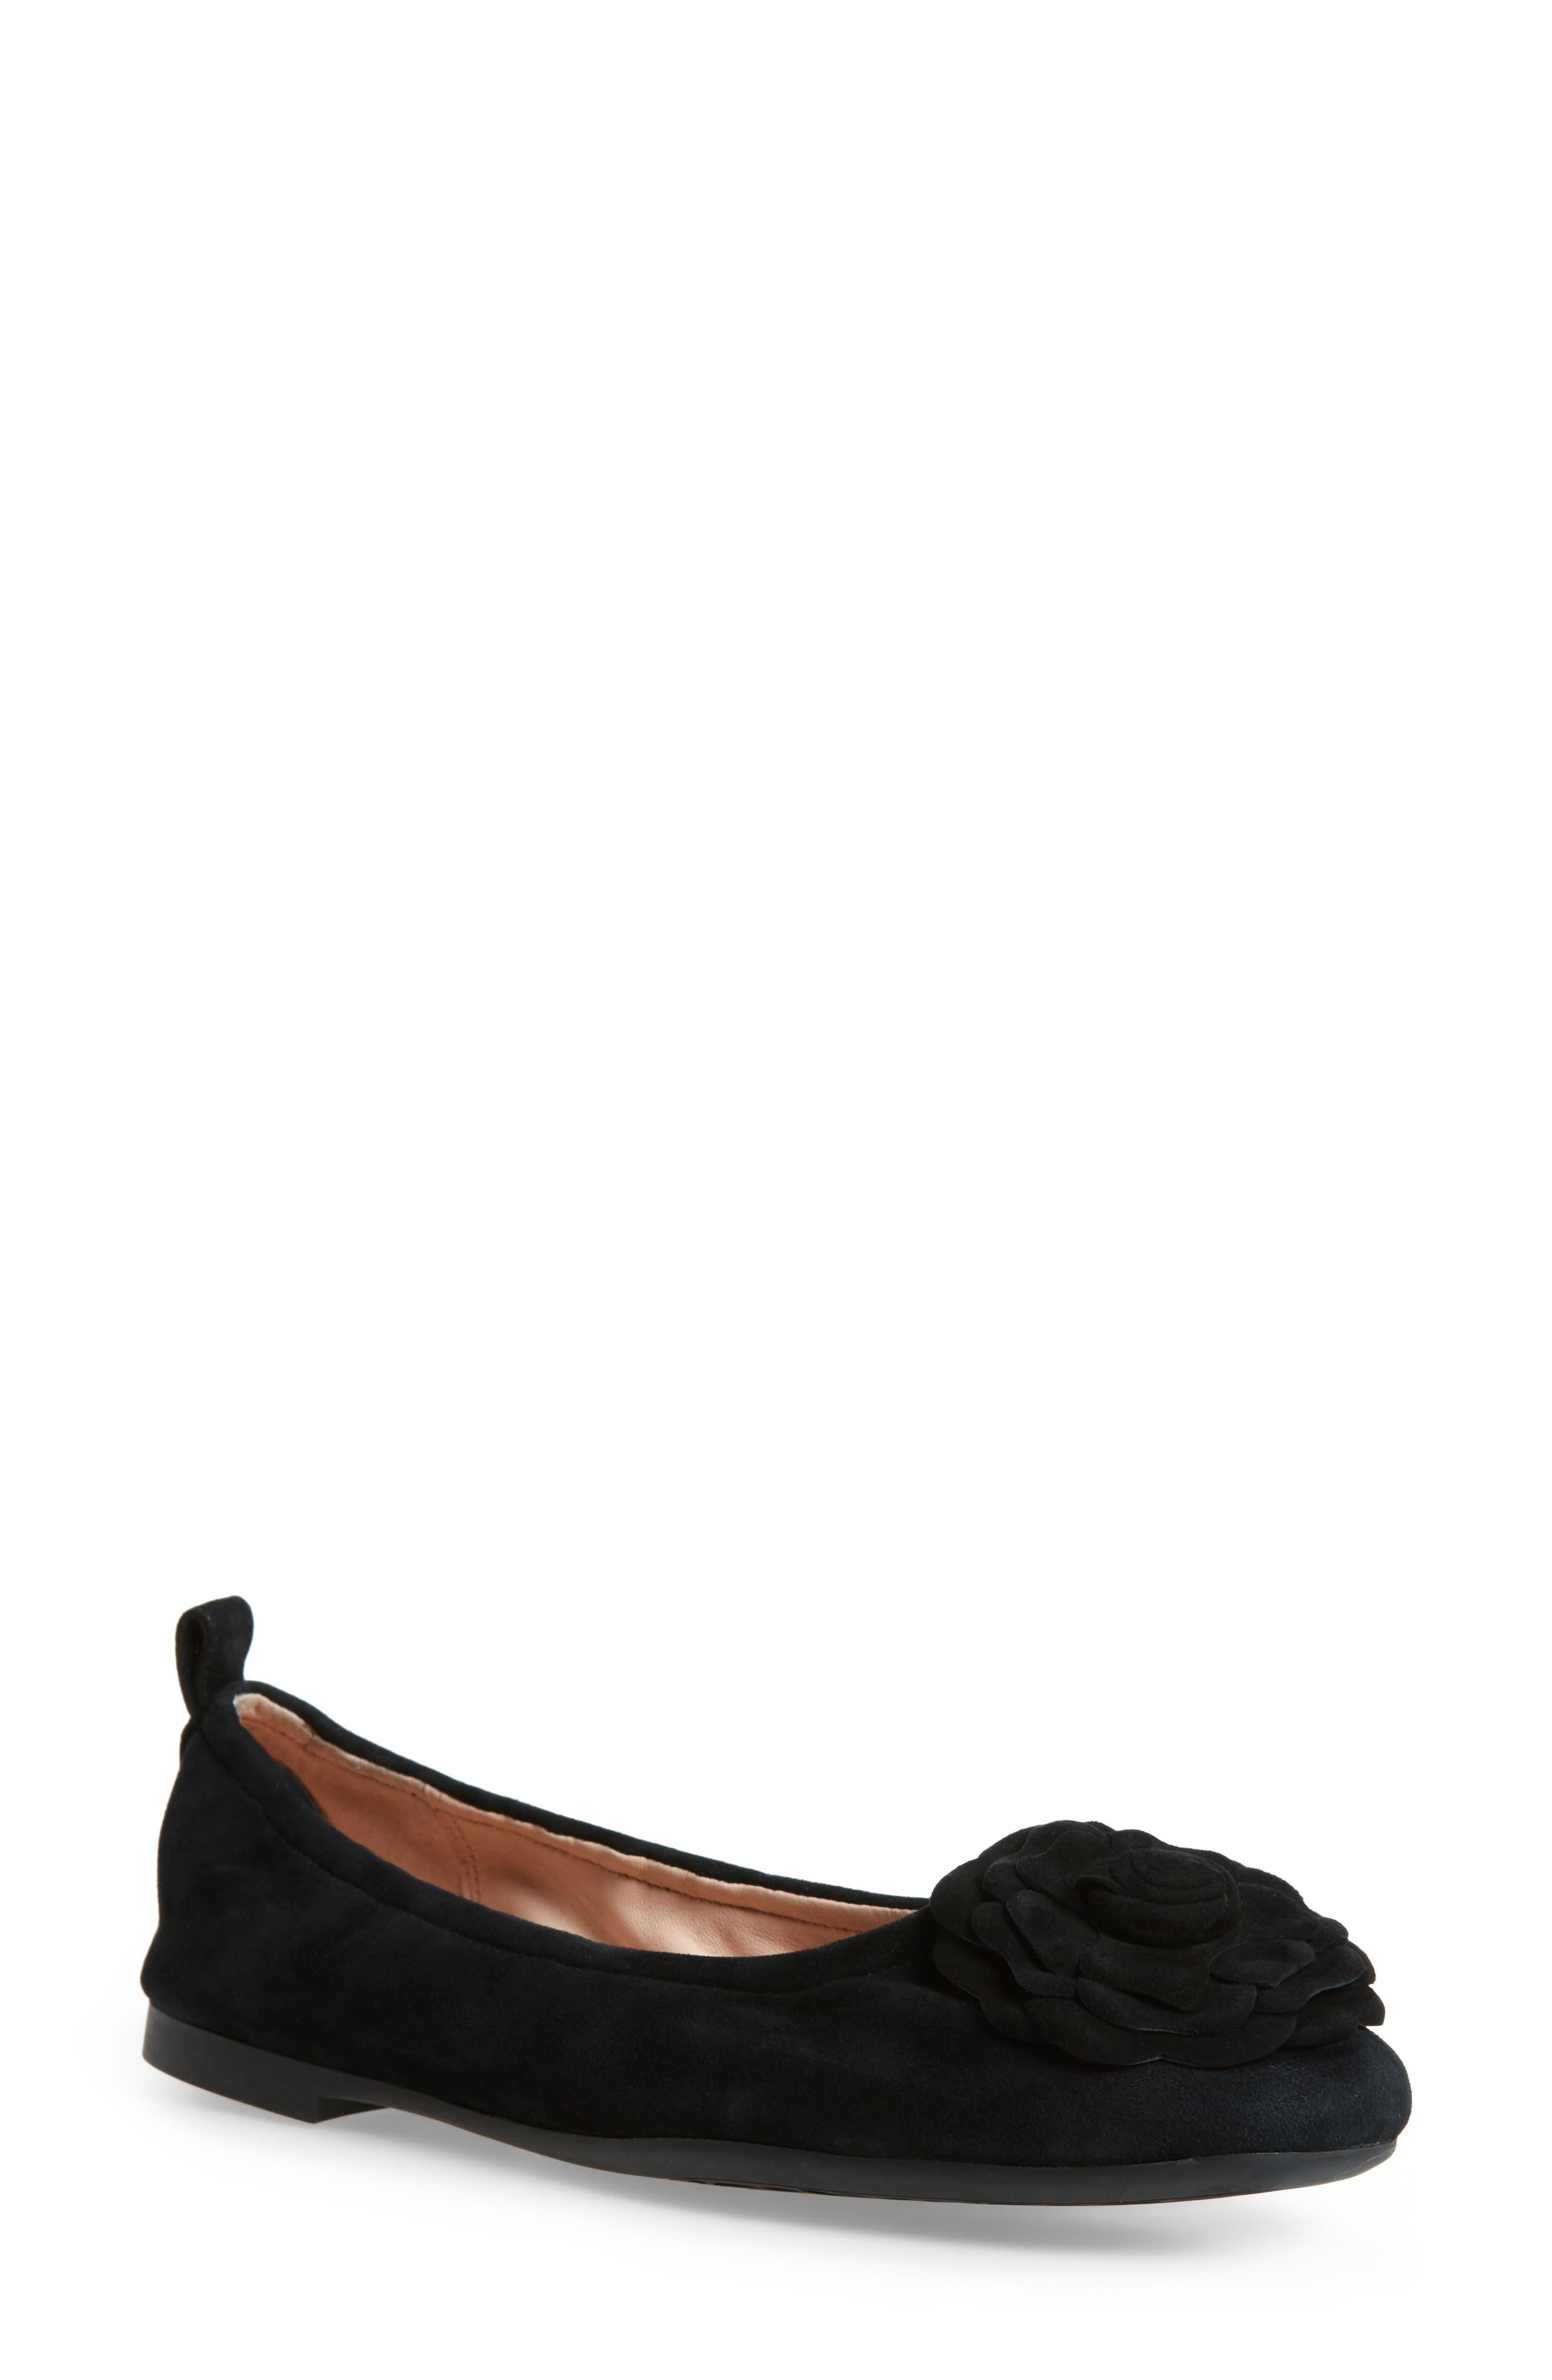 Rosalyn Ballet Flat,                             Main thumbnail 1, color,                             BLACK SUEDE